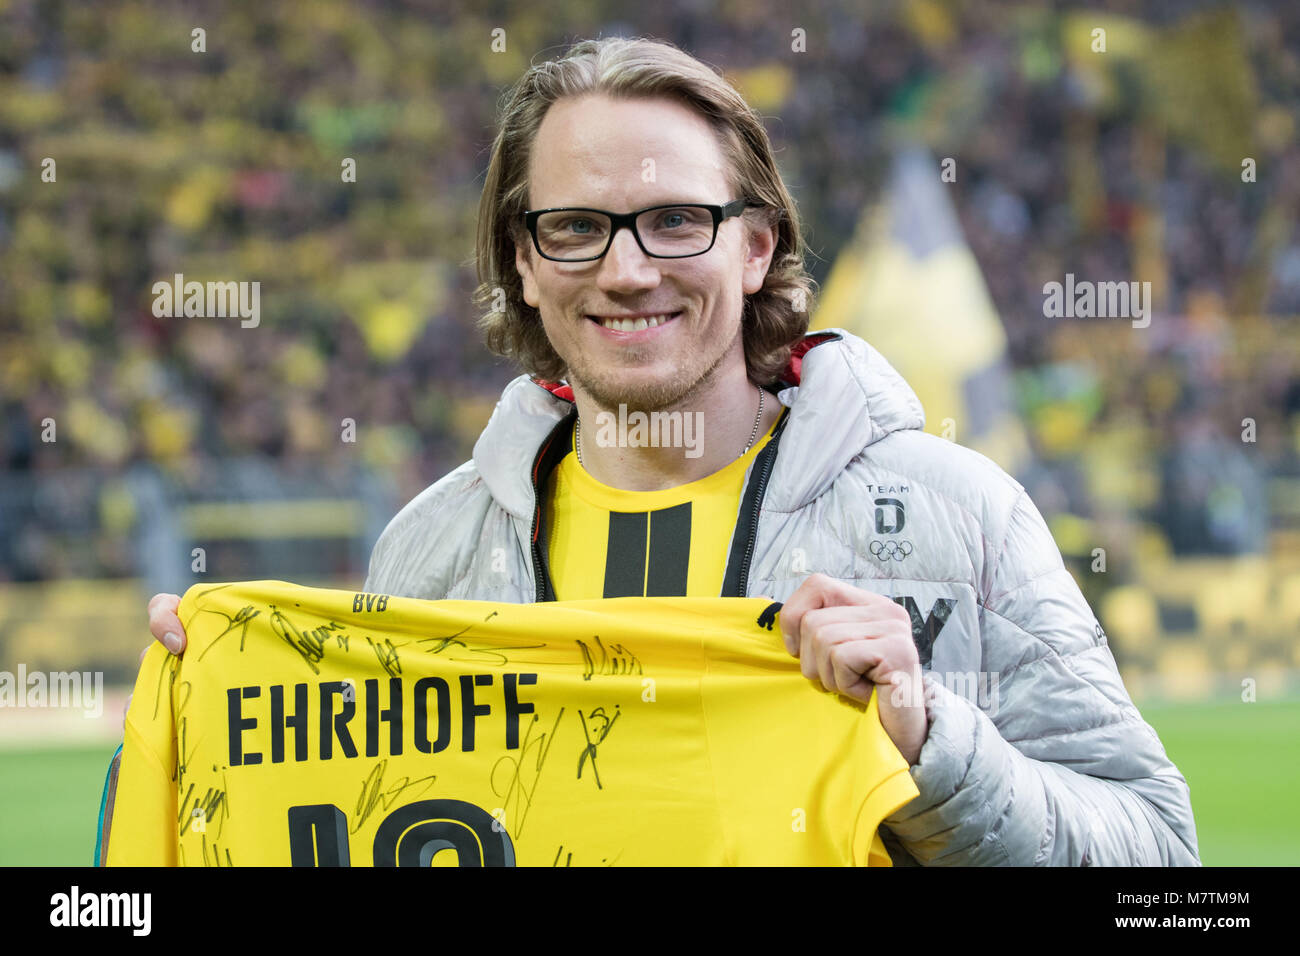 Christian EHRHOFF, Eishockeyspieler, GER, with BVB Trikot ist zu Gast im Dortmunder Stadion,  Fussball 1. Bundesliga, - Stock Image